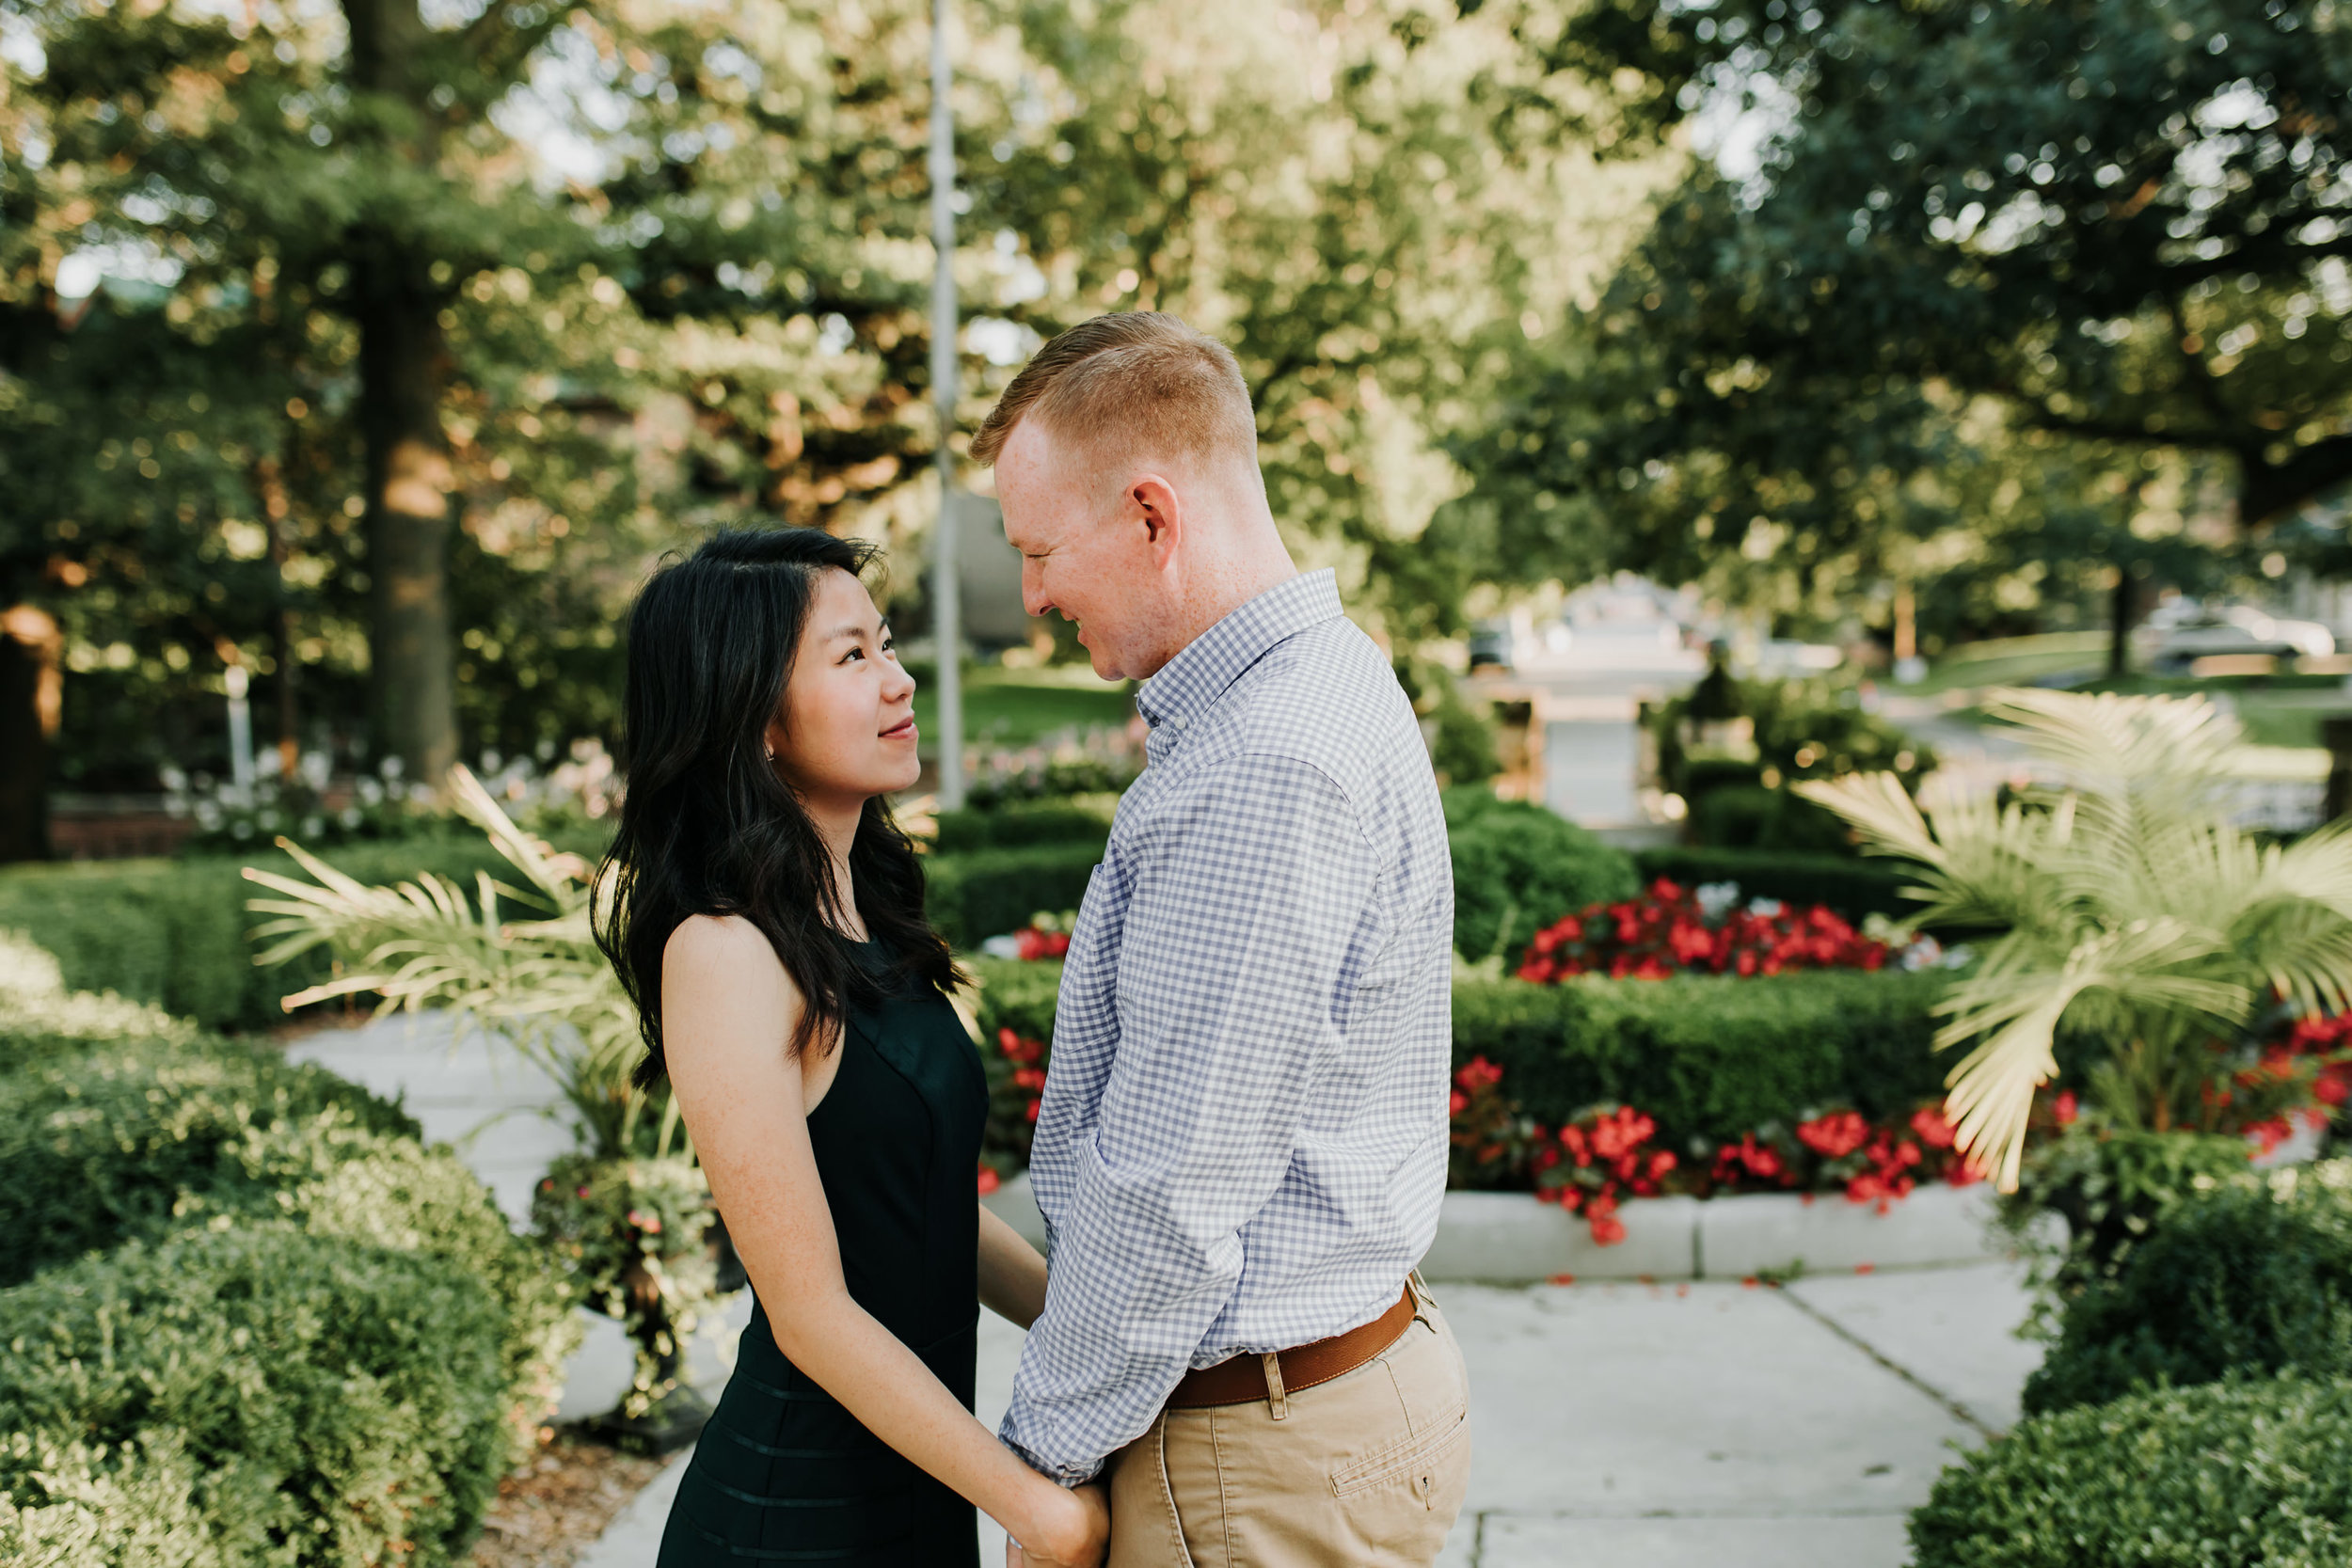 Catherin & Kyle - Married - Nathaniel Jensen Photography - Omaha Nebraska Wedding Photograper - Memorial Park - Joslyn Castle Engagement Session-43.jpg